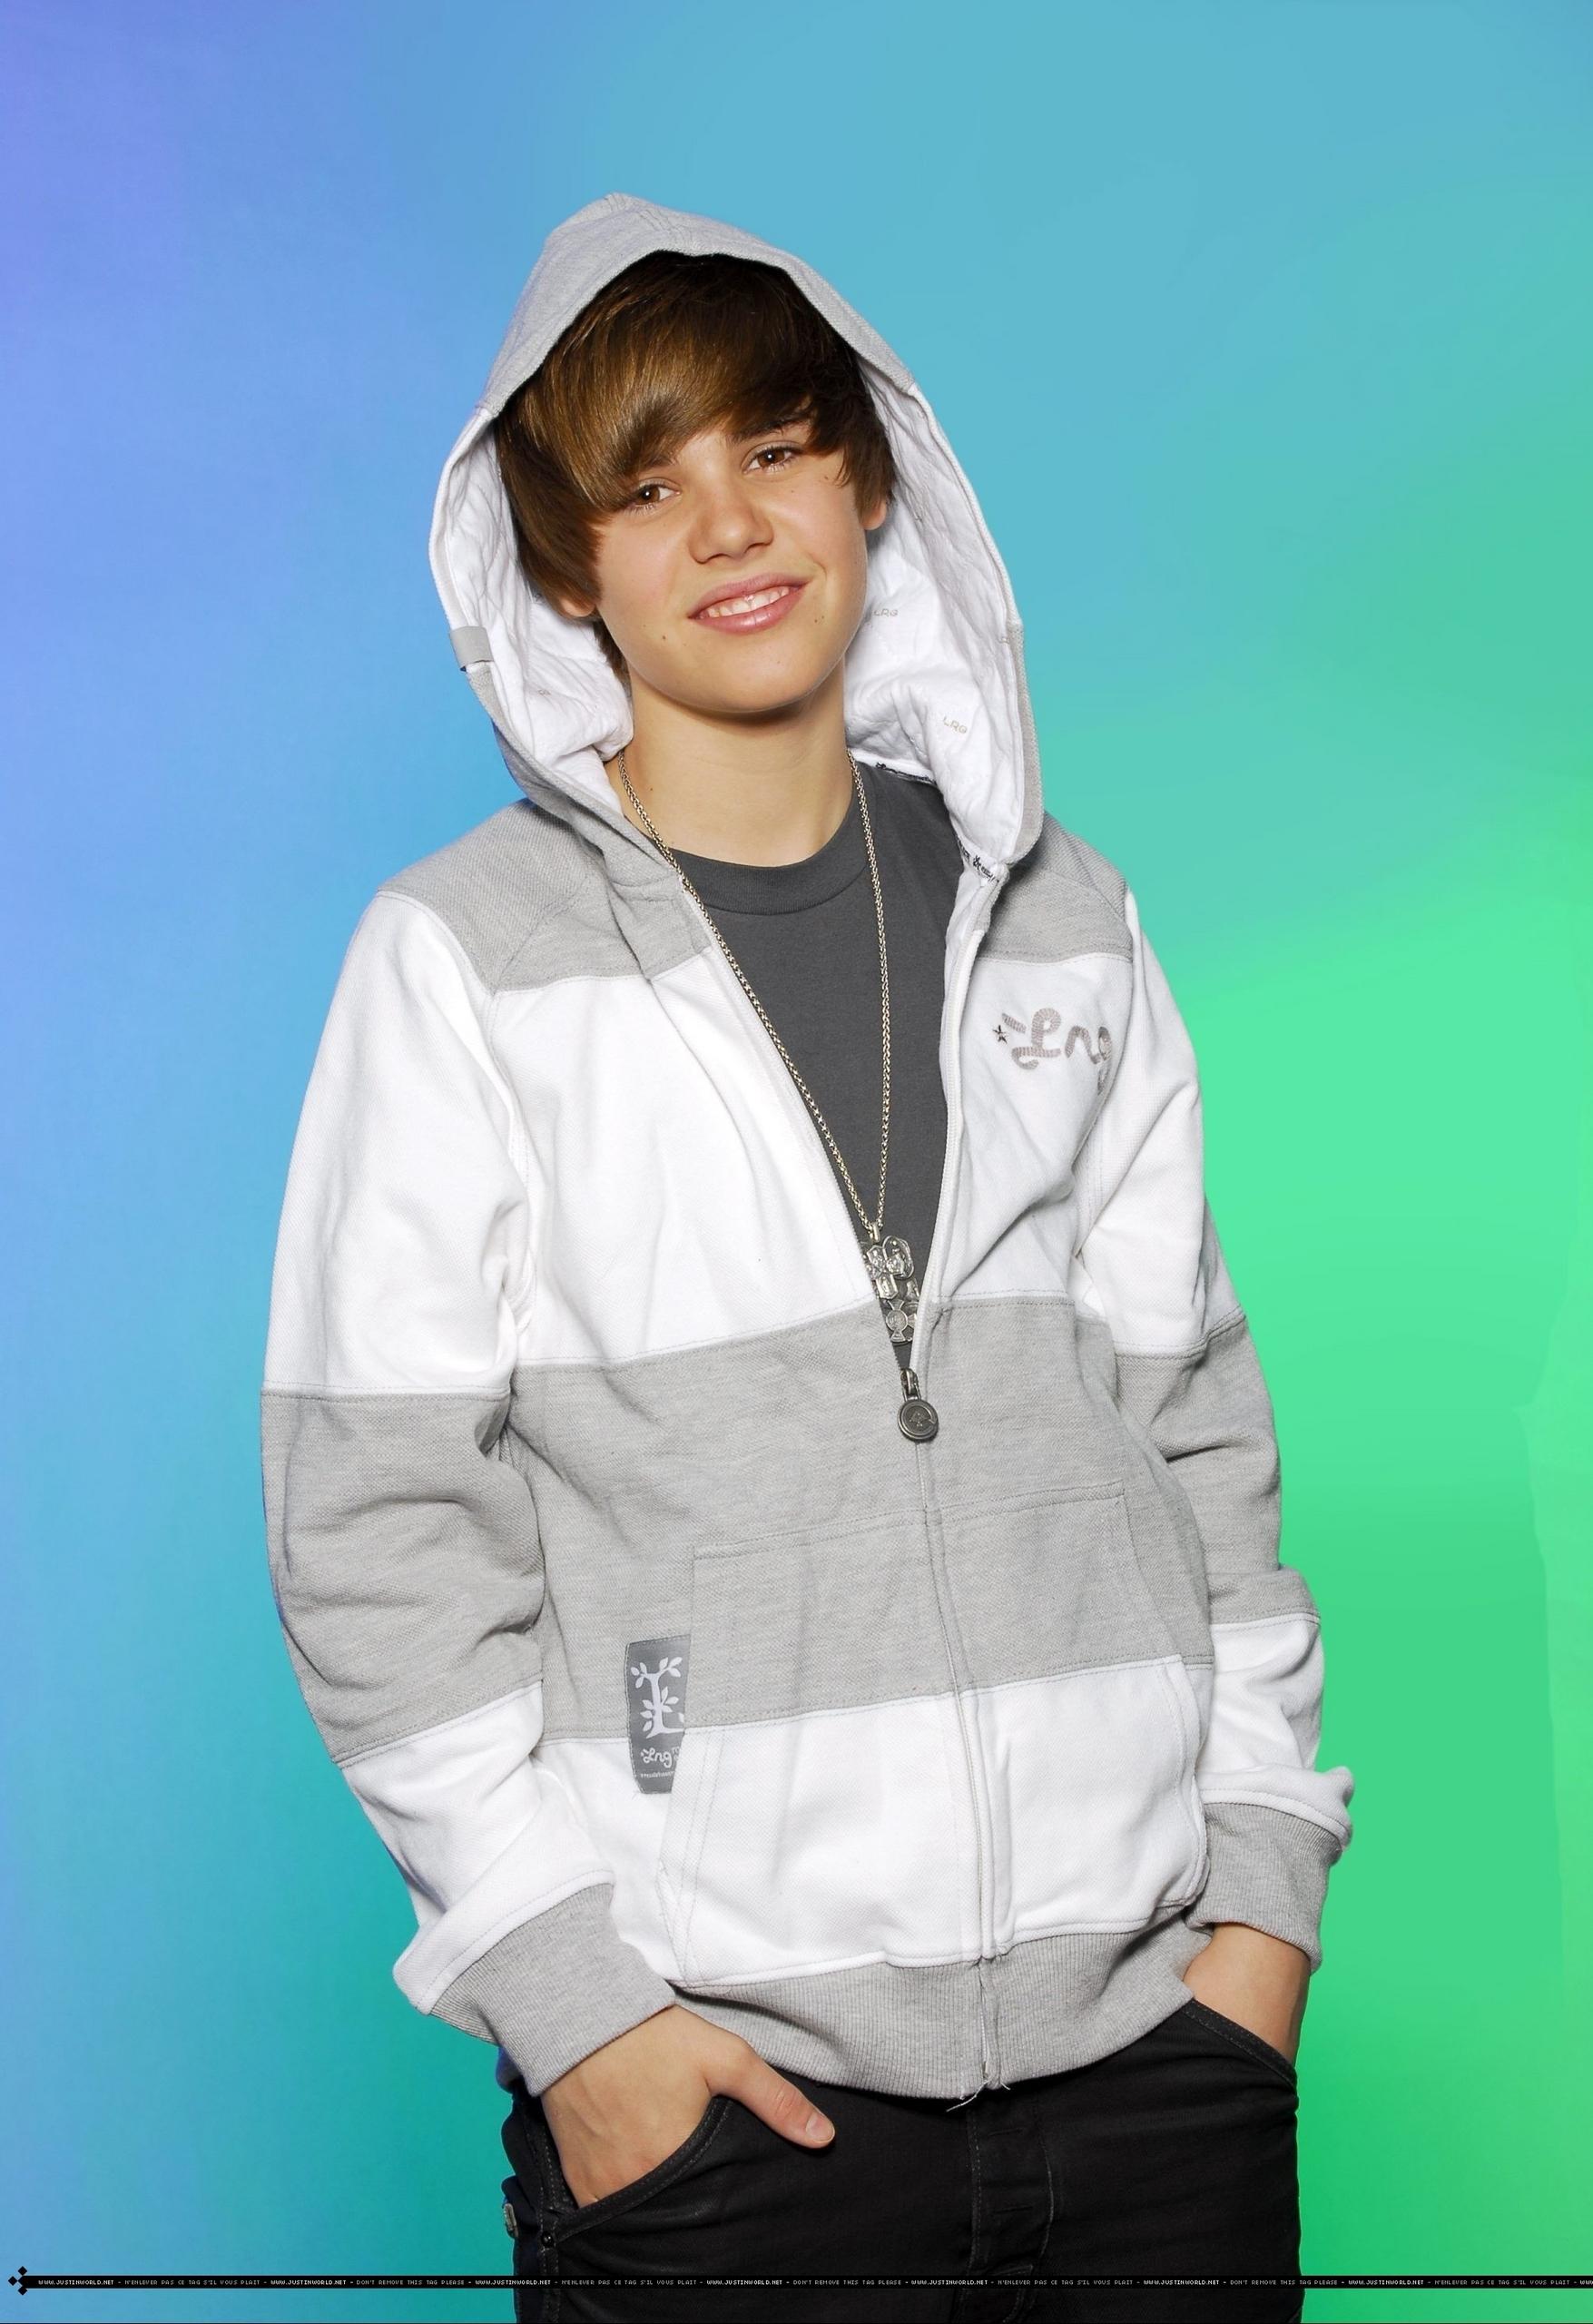 ♥. - Justin Bieber Photo (26507360) - Fanpop